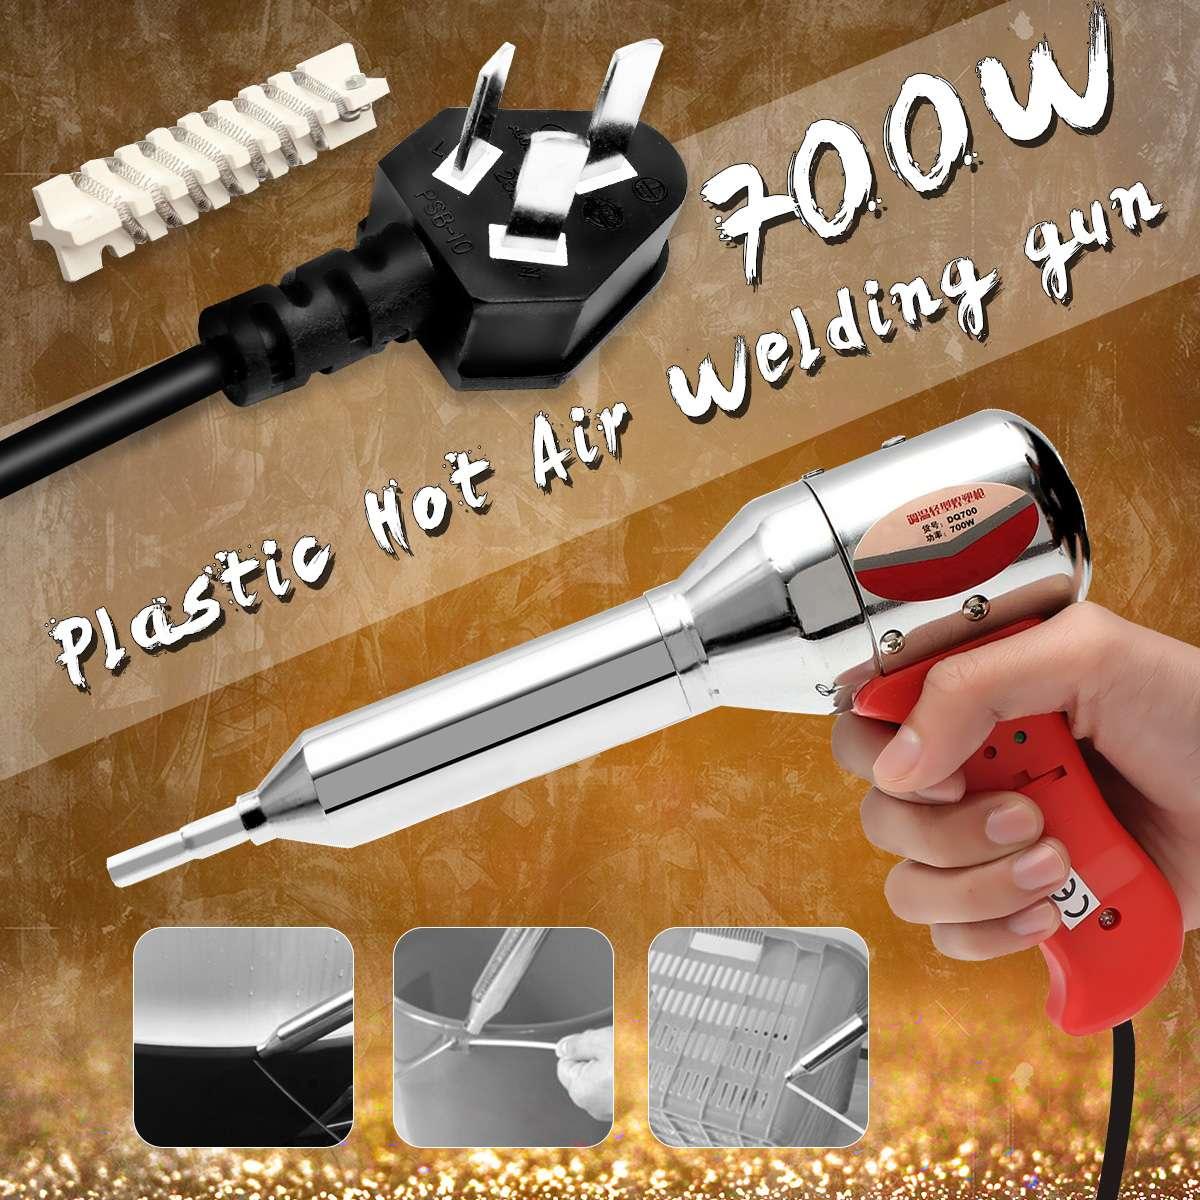 Hot Portable 700W AC 220-240V Red Plastic Hot Air Welding Gun Temperature Heat 100-450 Degree With Ceramic Heater